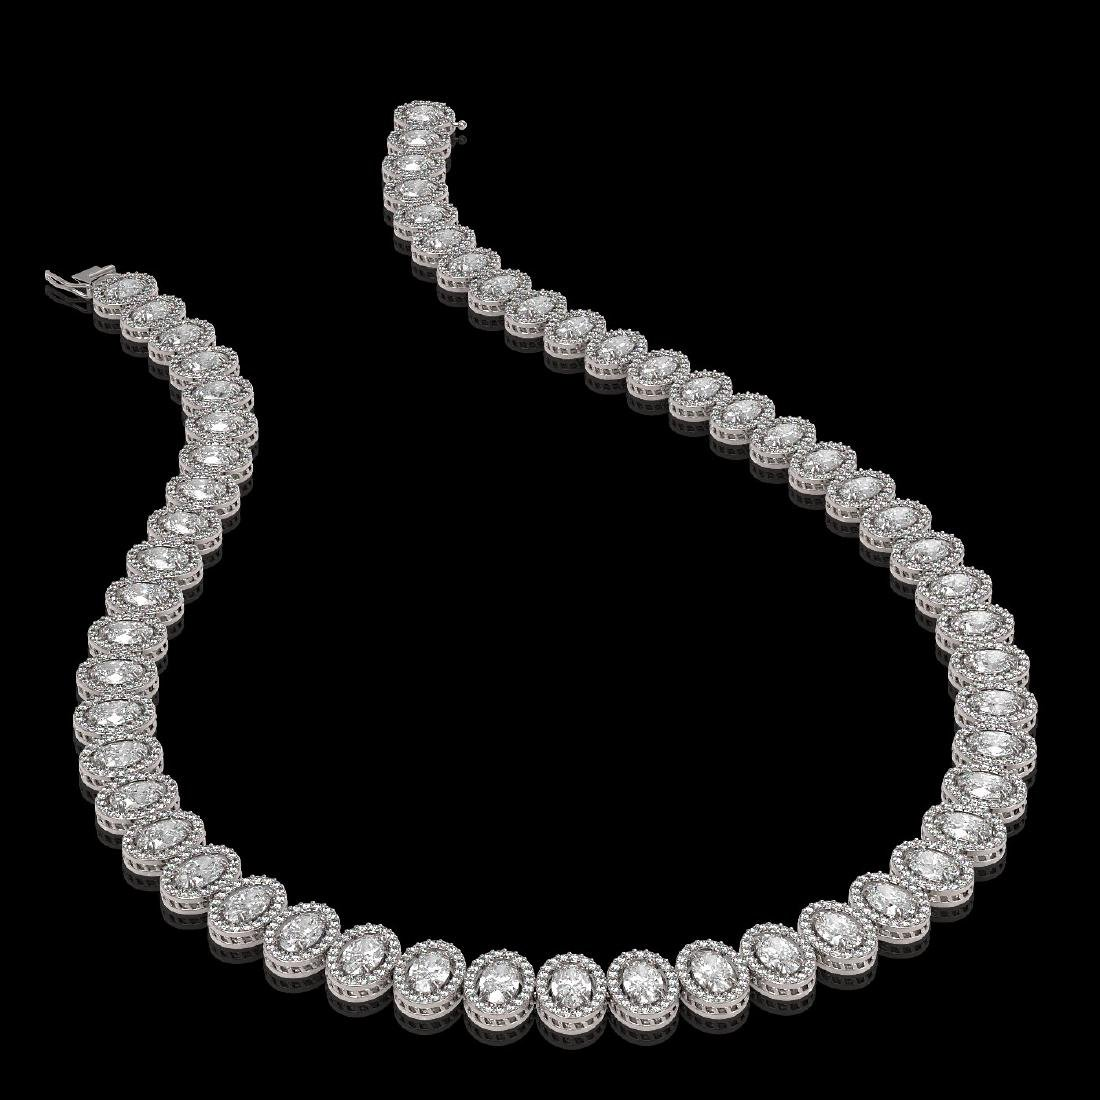 34.72 CTW Oval Diamond Designer Necklace 18K White Gold - 2